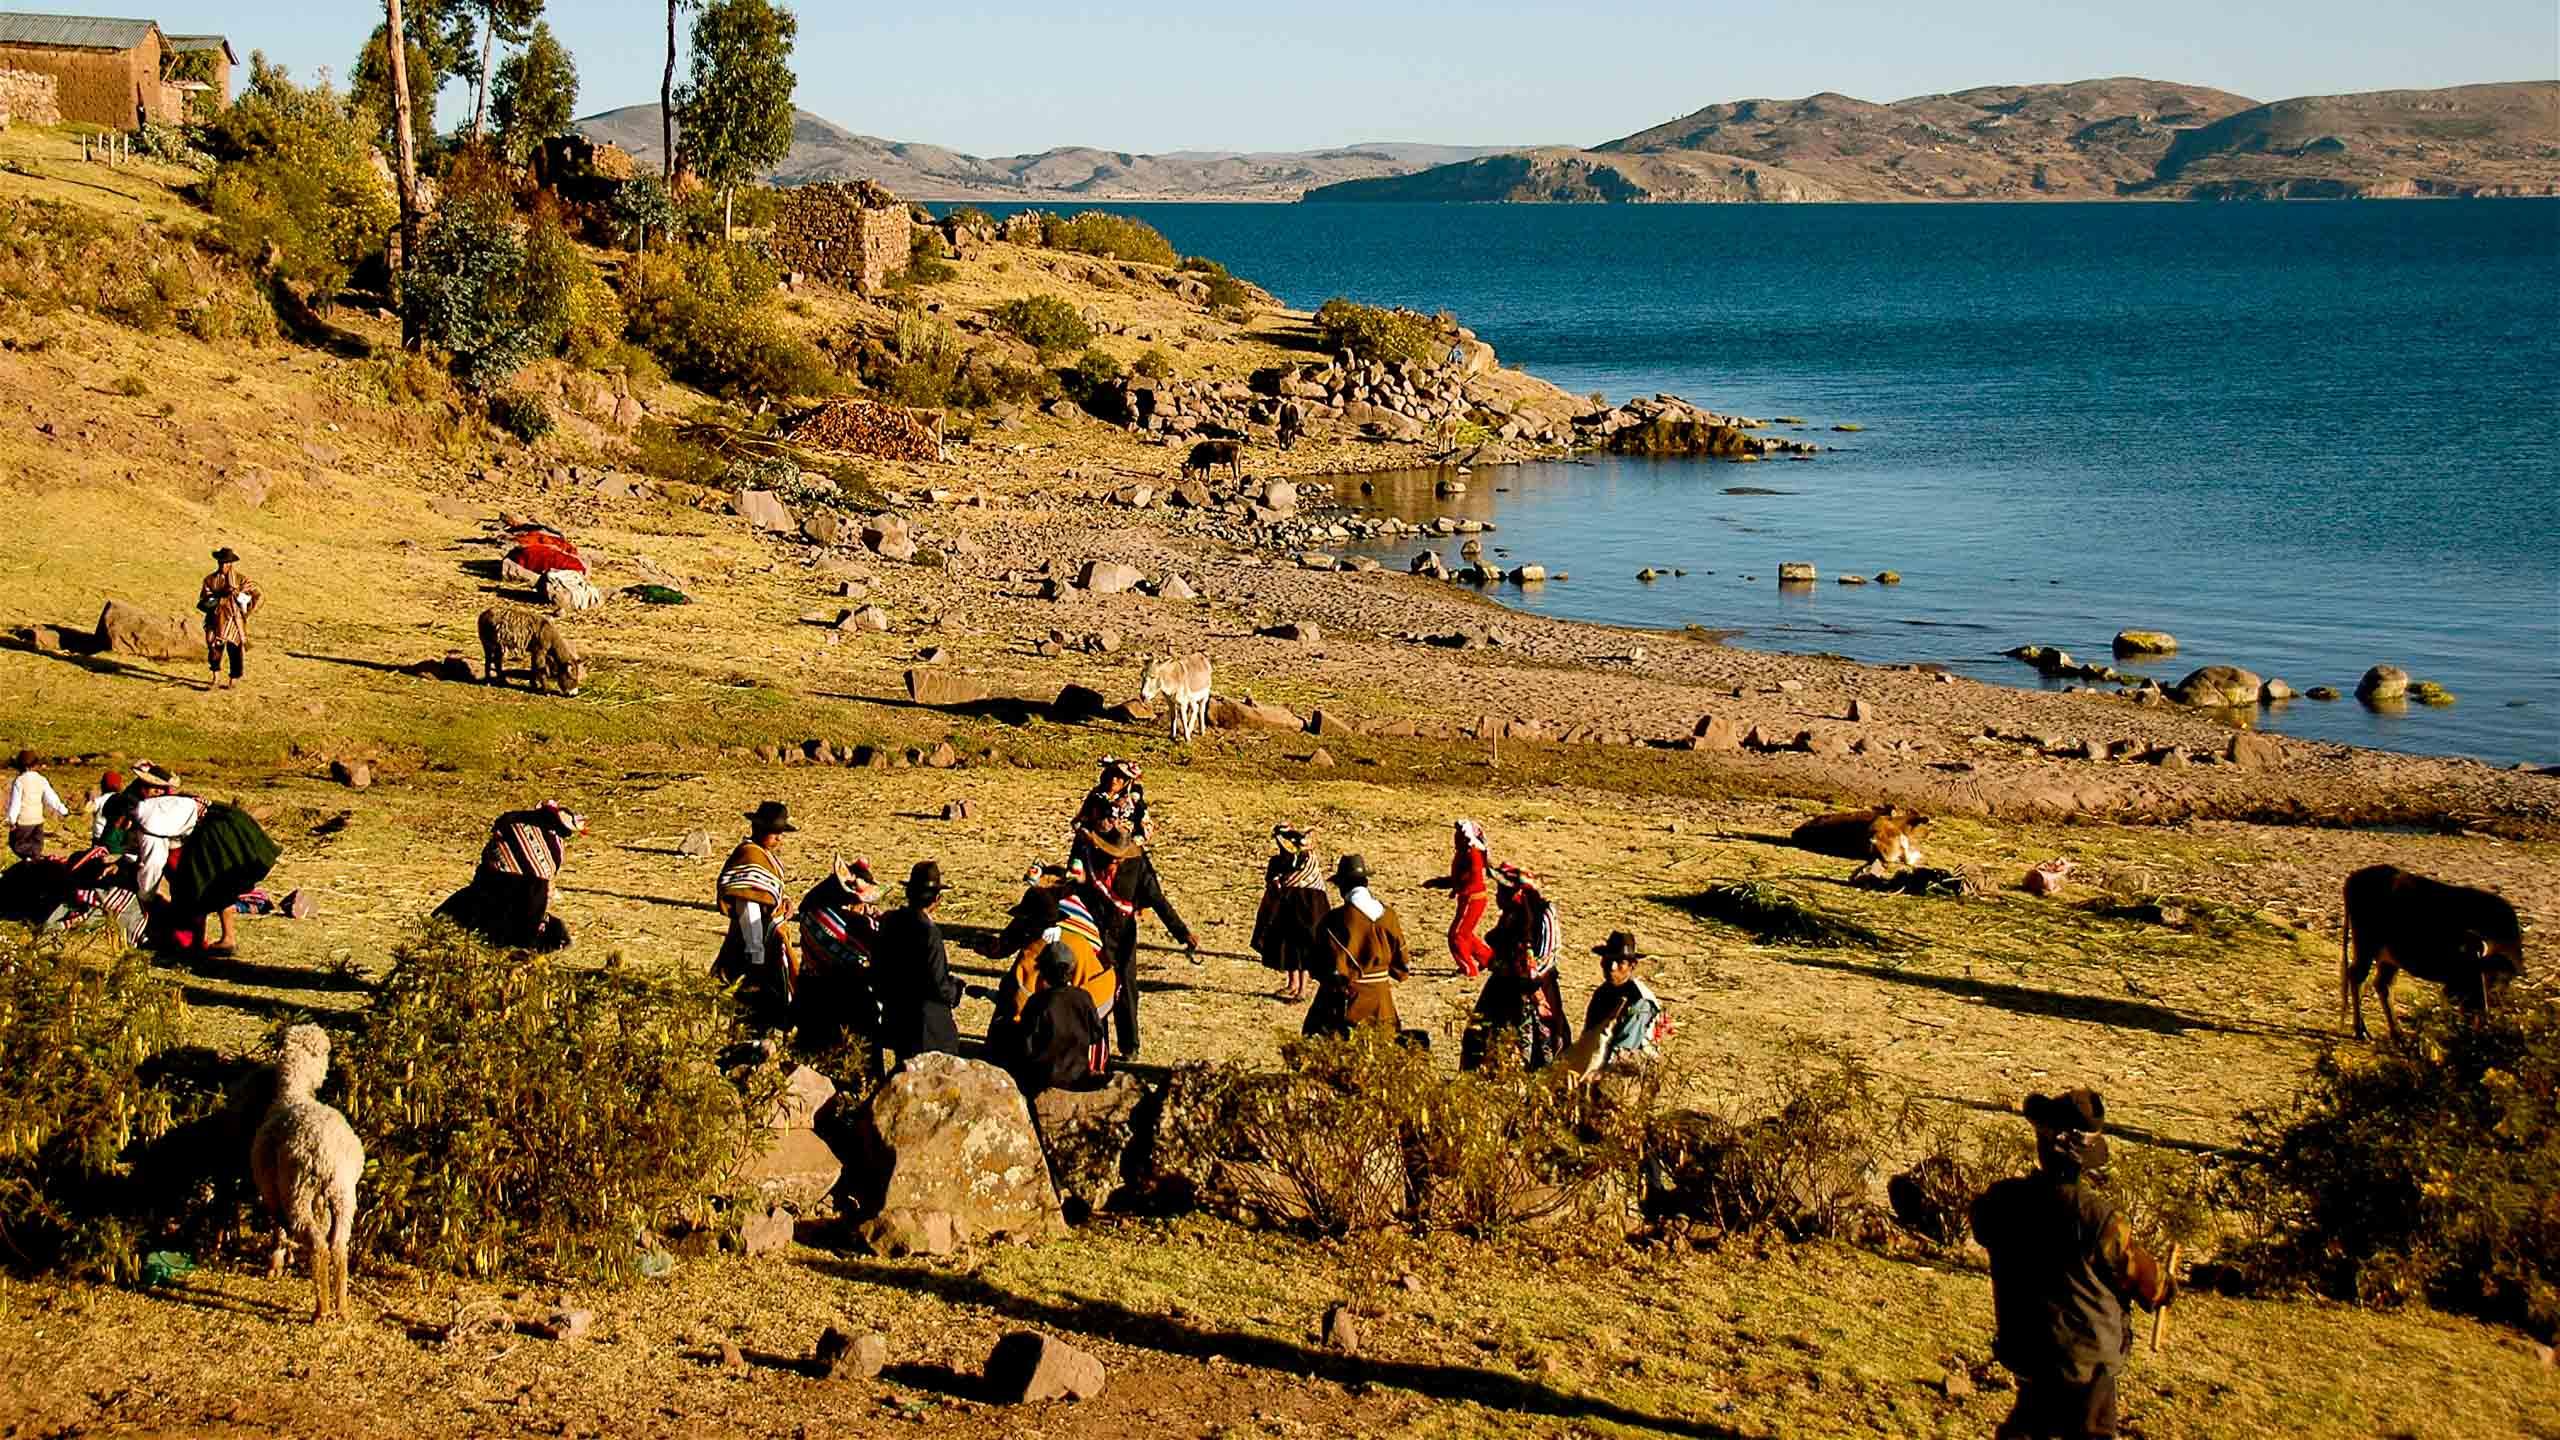 Peru people on plain near water